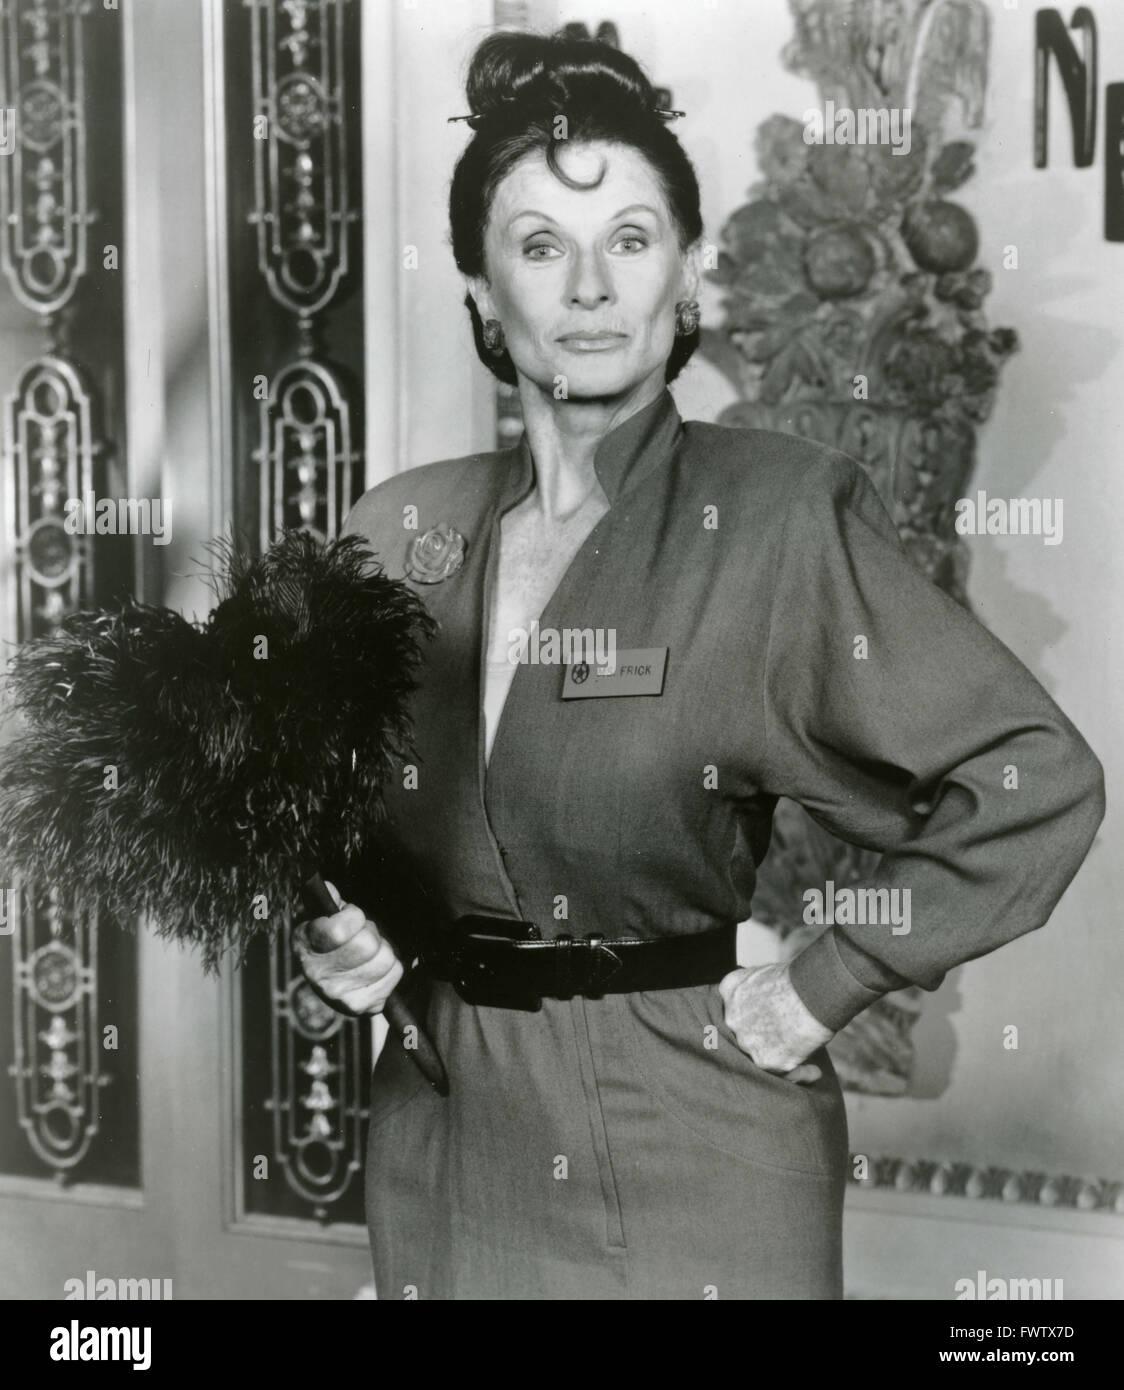 Cloris Leachman como la Sra. Frick en el Nutt House, USA 1989 Imagen De Stock